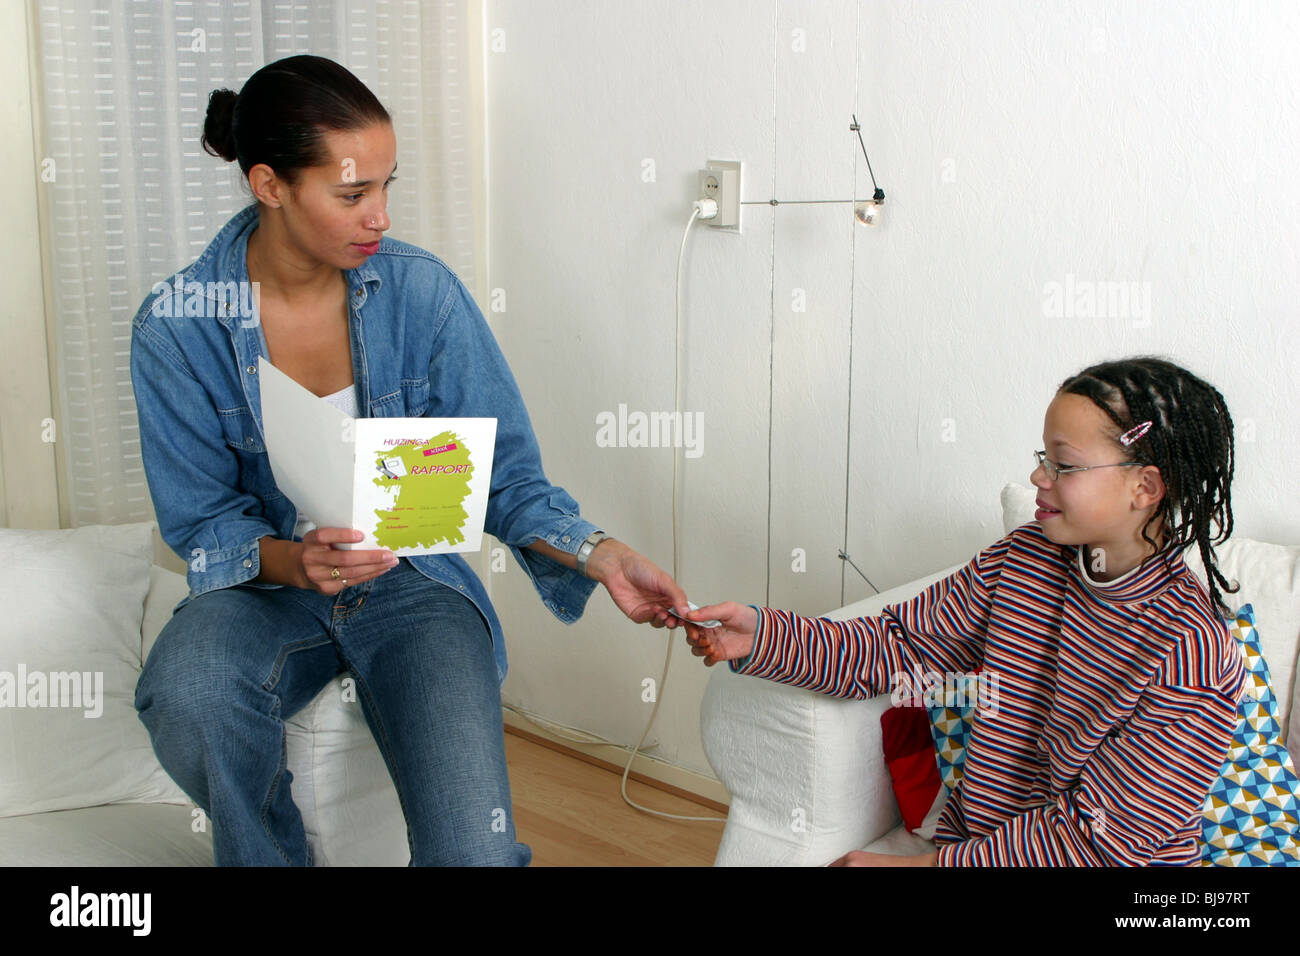 Child getting pocket money for good school report SerieCVS117007 - Stock Image